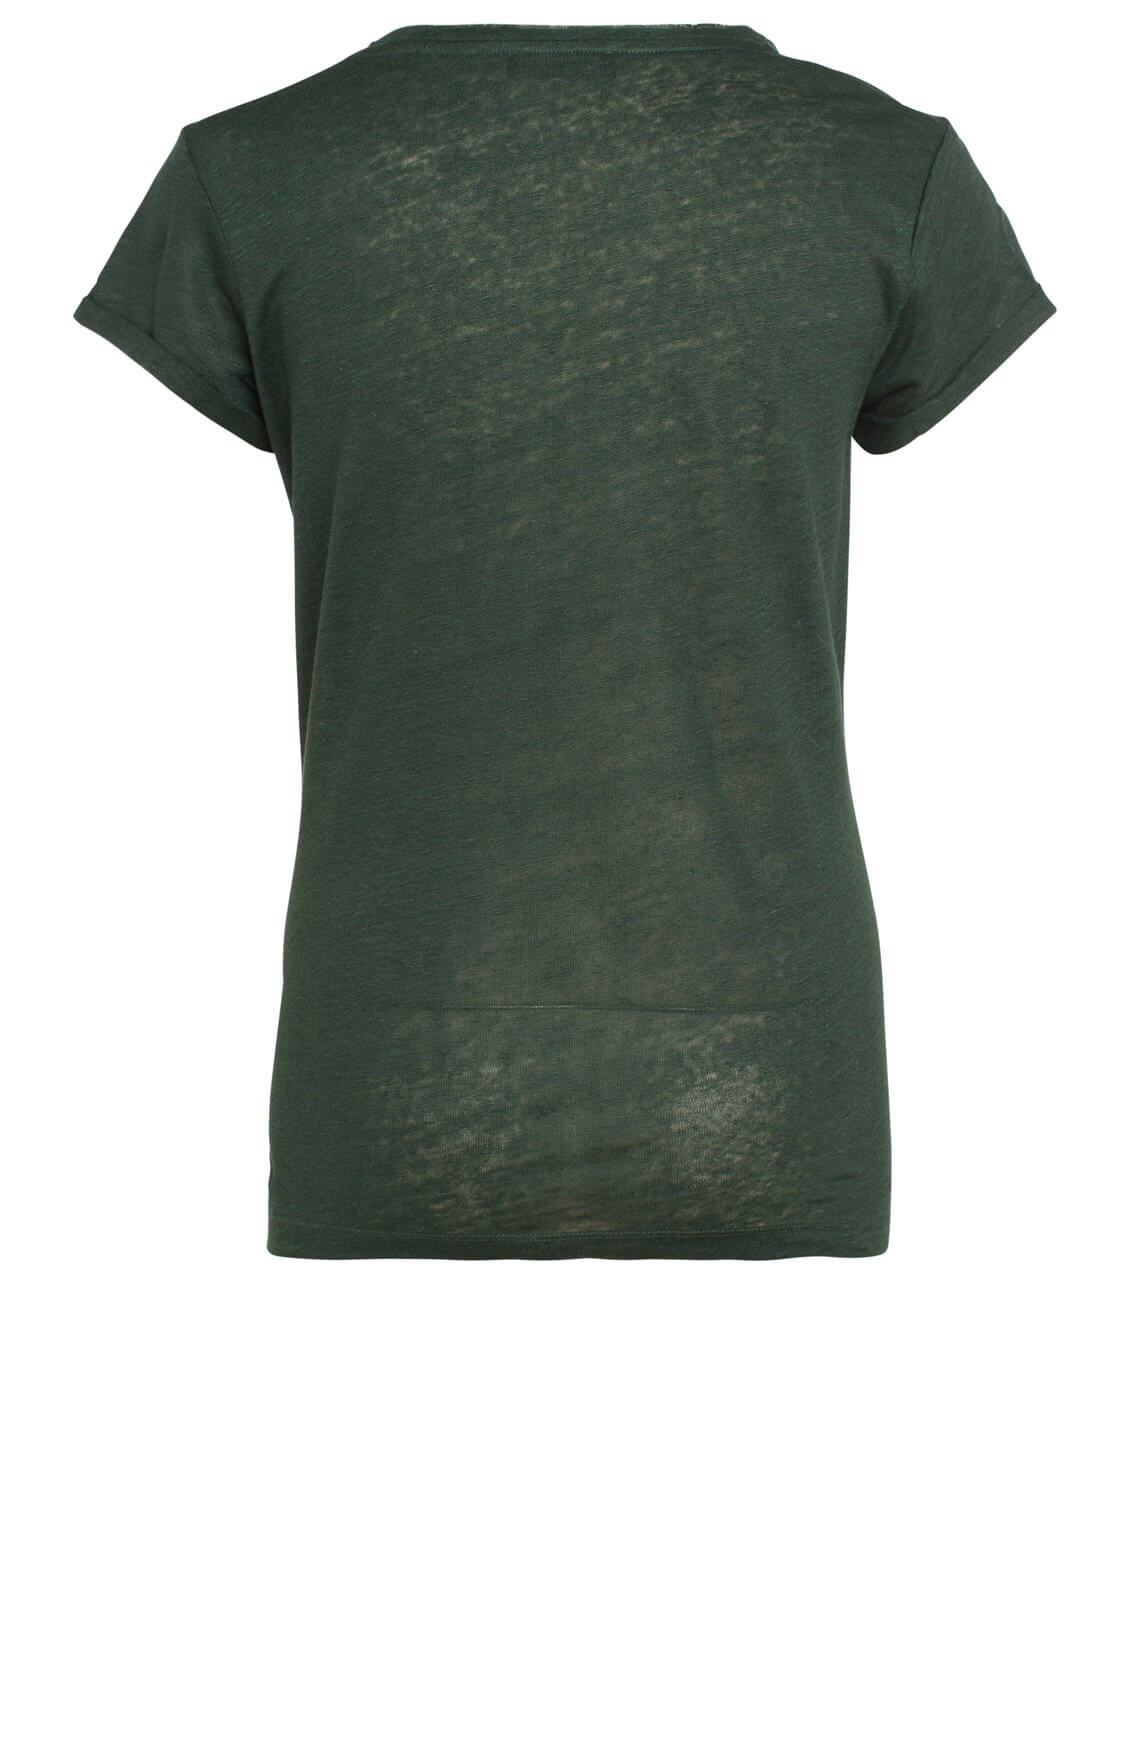 Mos Mosh Dames Leavetee shirt met pailletten groen